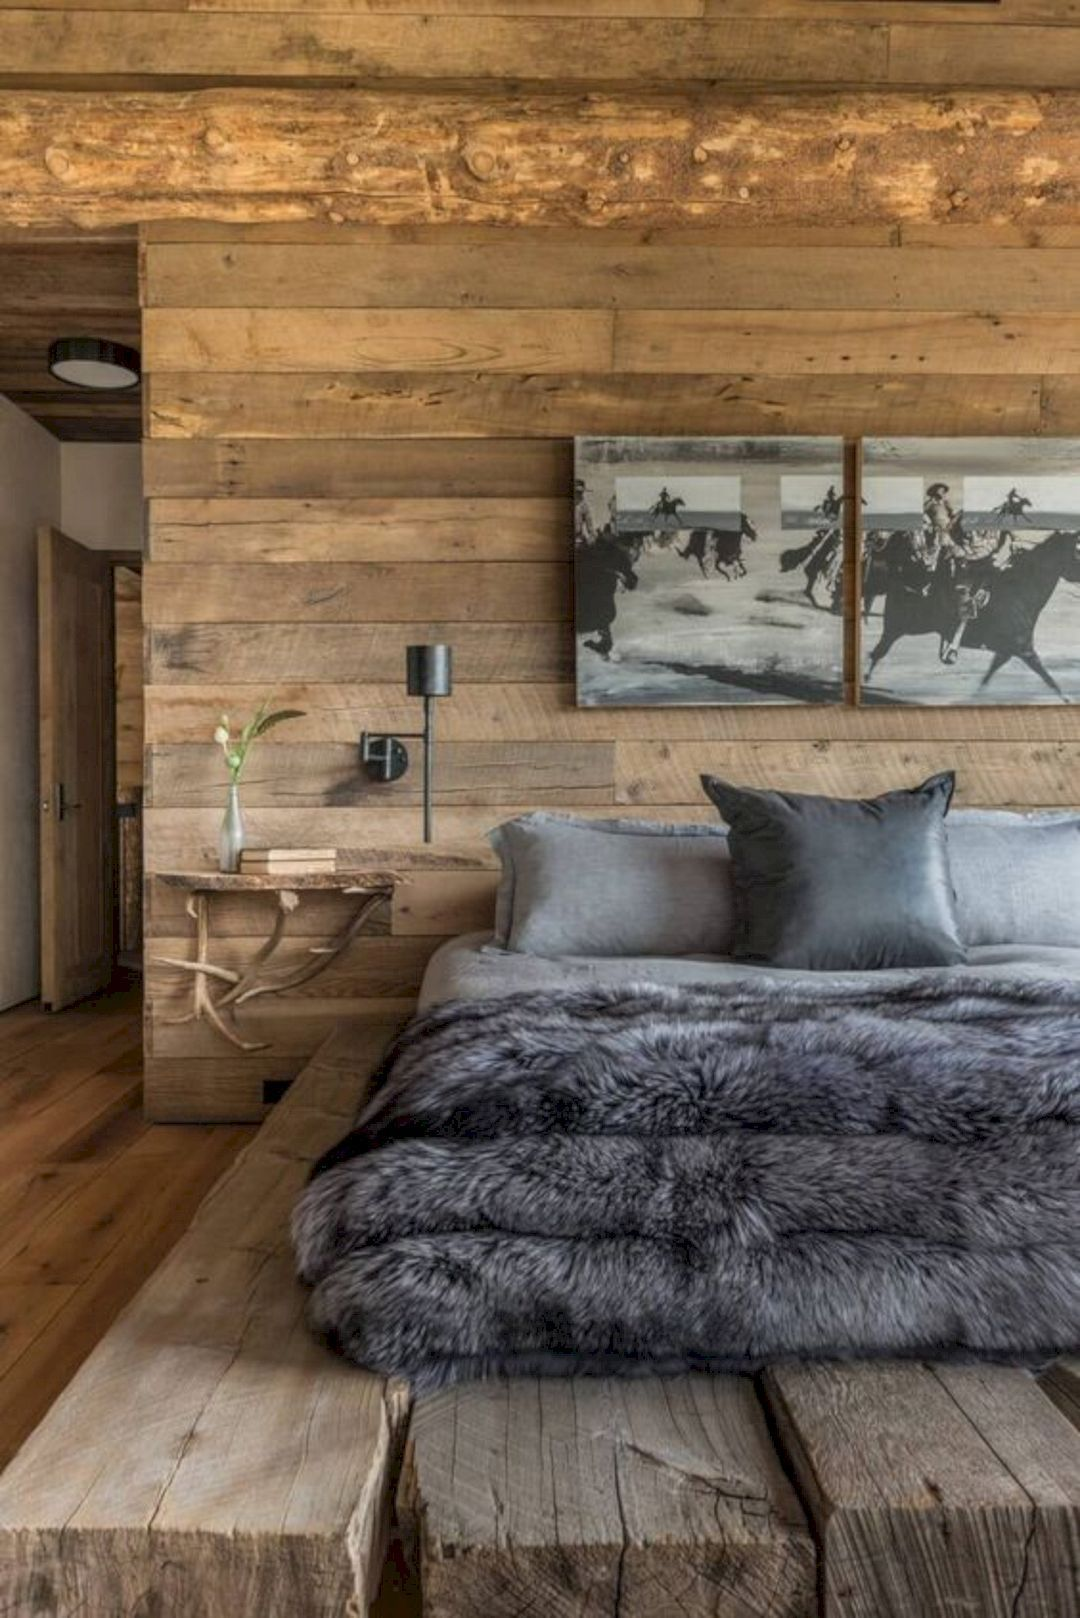 Bedroom 4 by 4 Design: Design Ideas